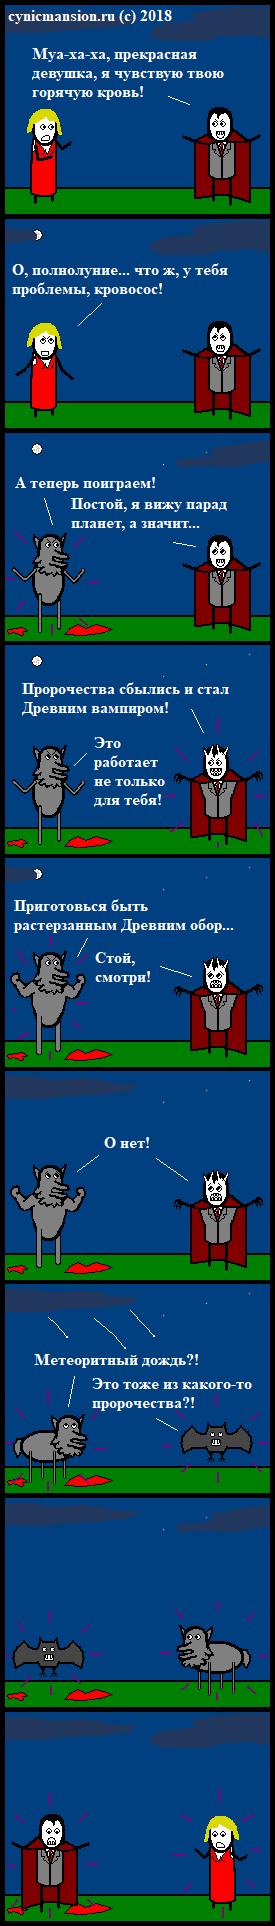 https://acomics.ru/upload/!c/killallhumans/cynic-mansion/001408-lo7quy0t9h.png